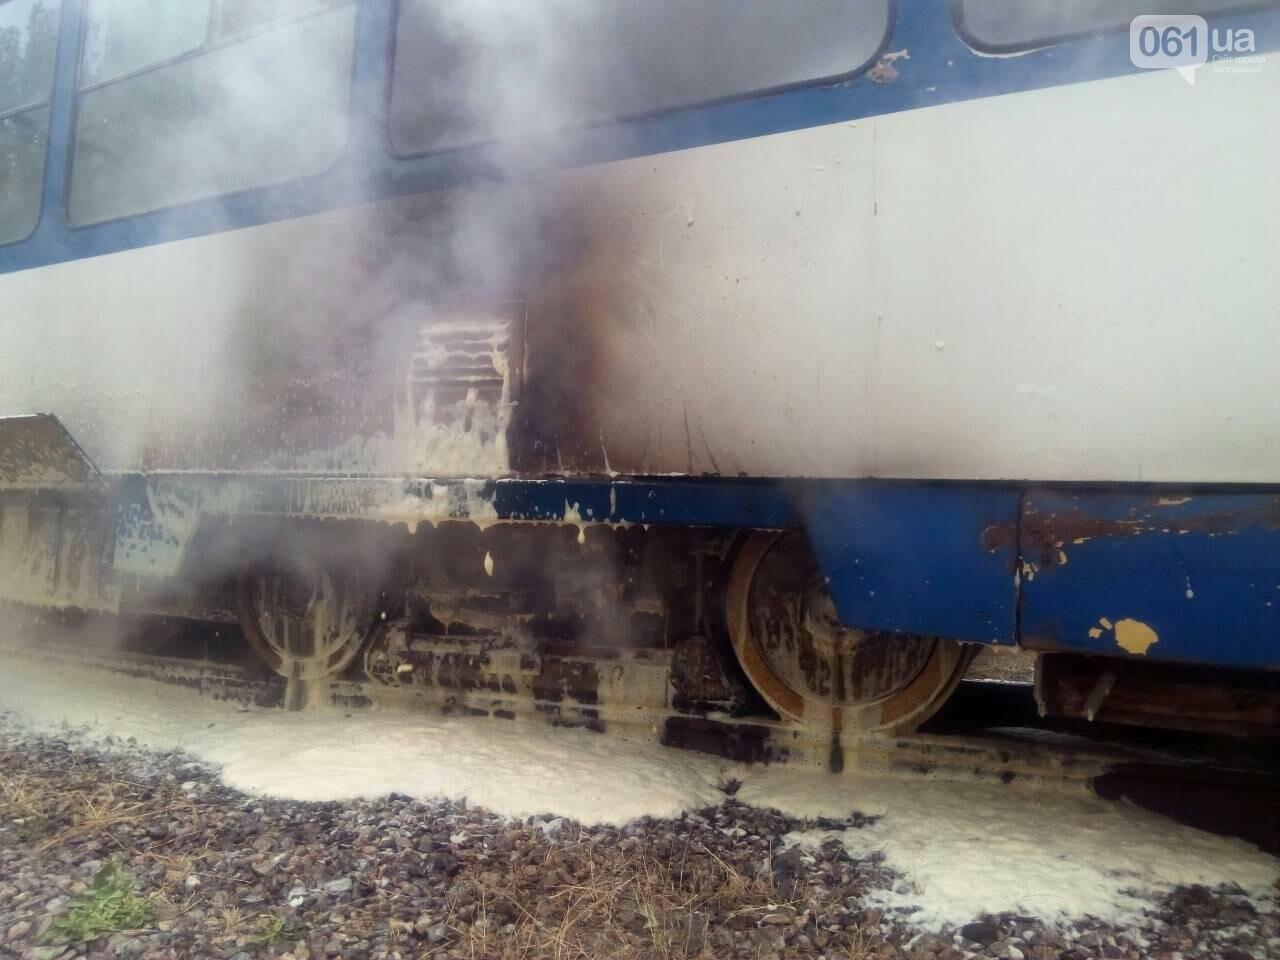 В Заводском районе Запорожья загорелся трамвай, - ФОТО, фото-2